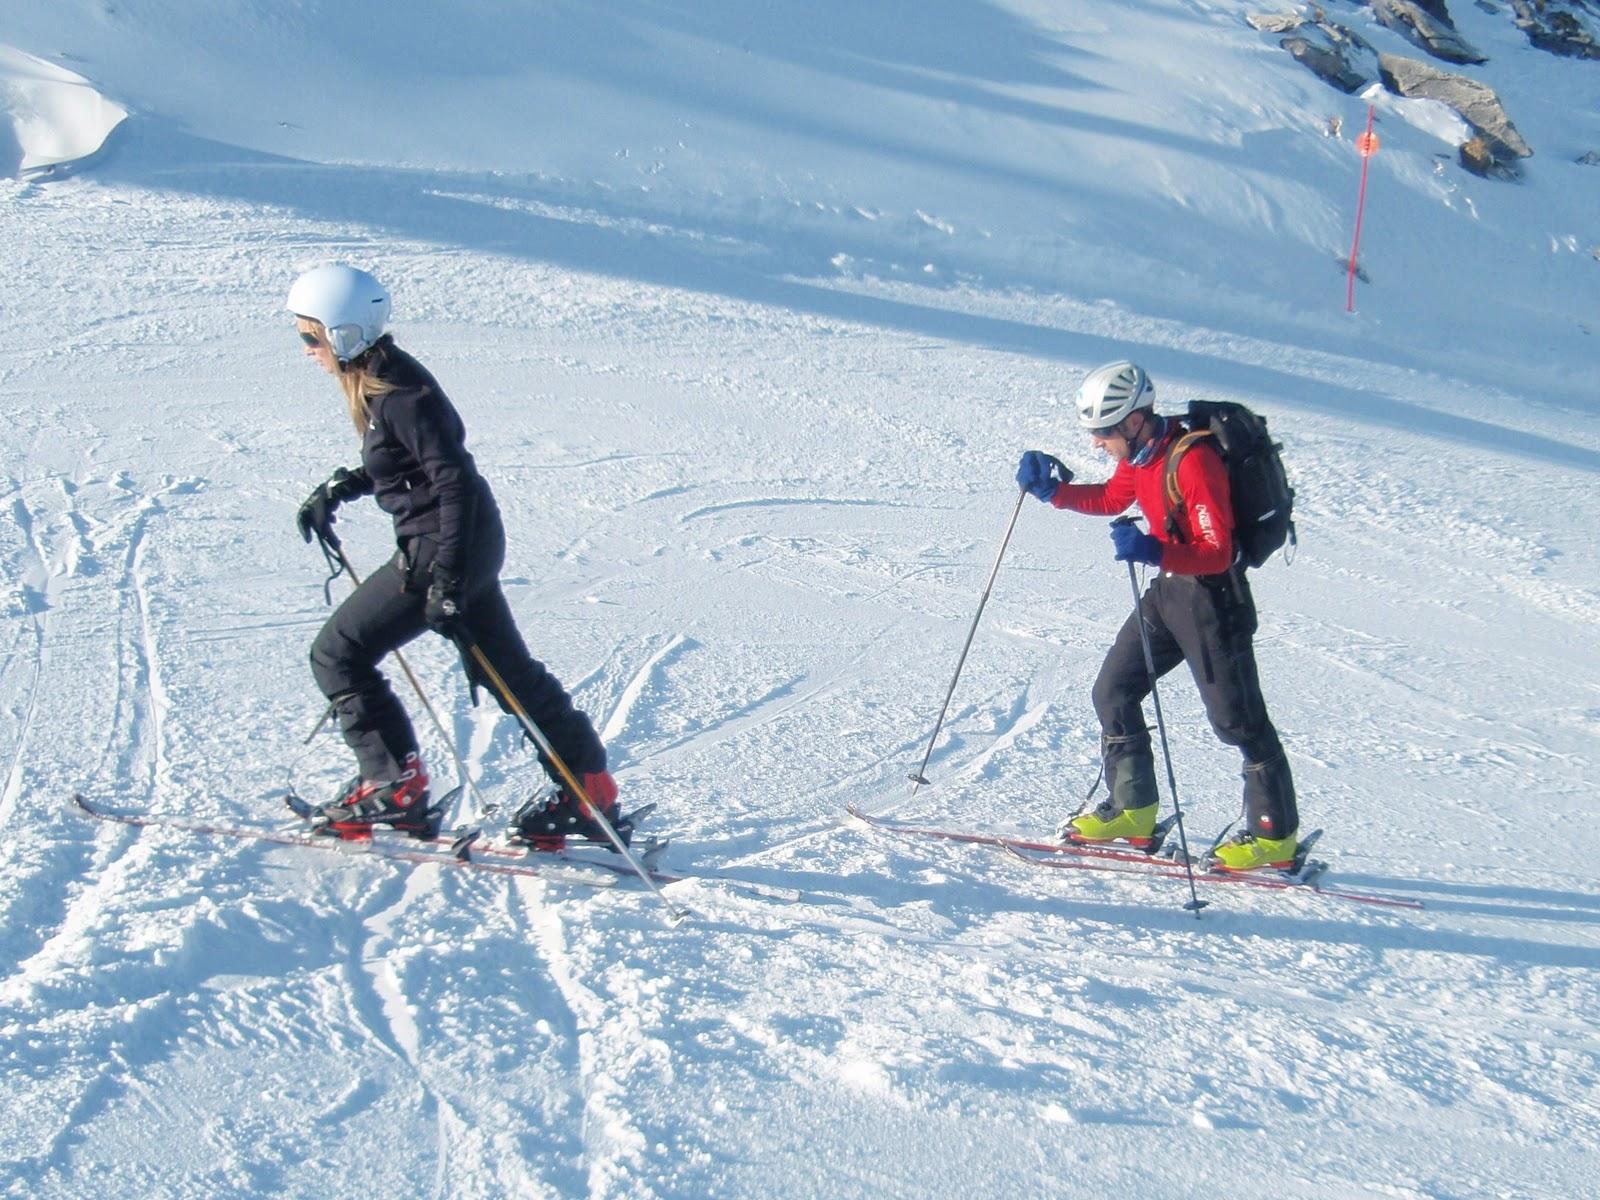 Pistas Ski Andorra Ski Andorra Difunde Las Reglas